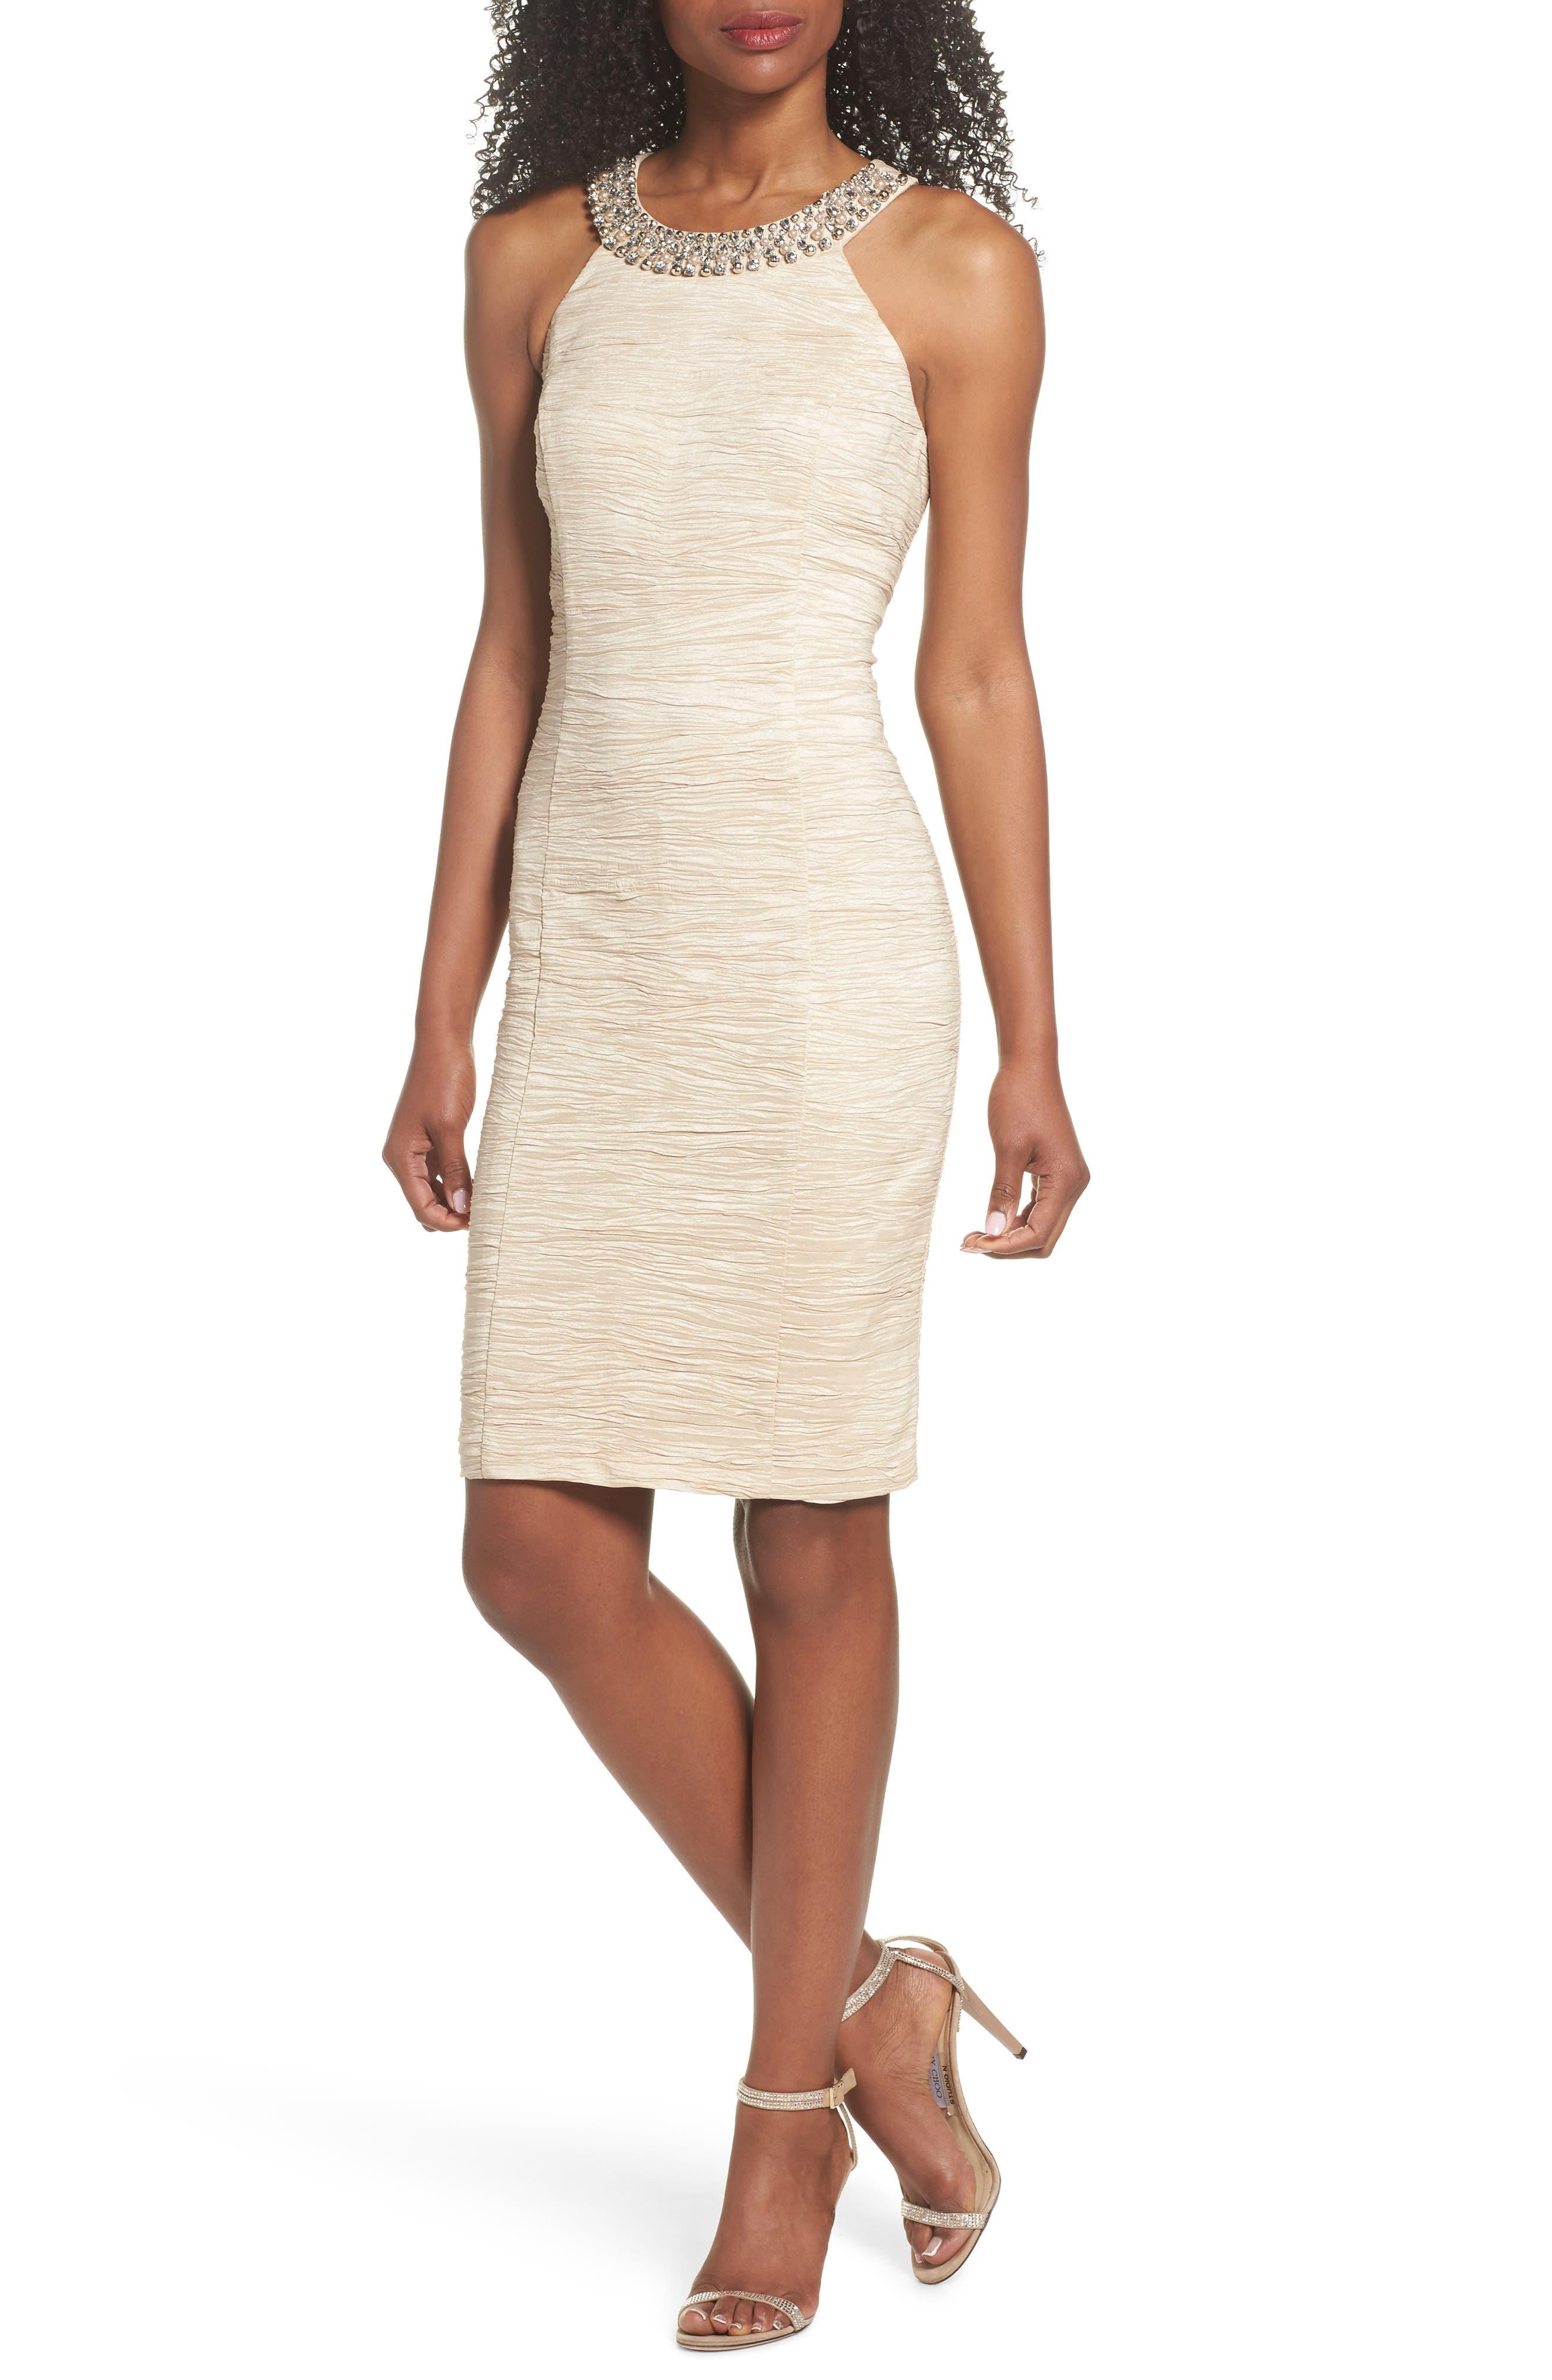 Embellished Crushed Taffeta Sheath Dress,                             Main thumbnail 1, color,                             250